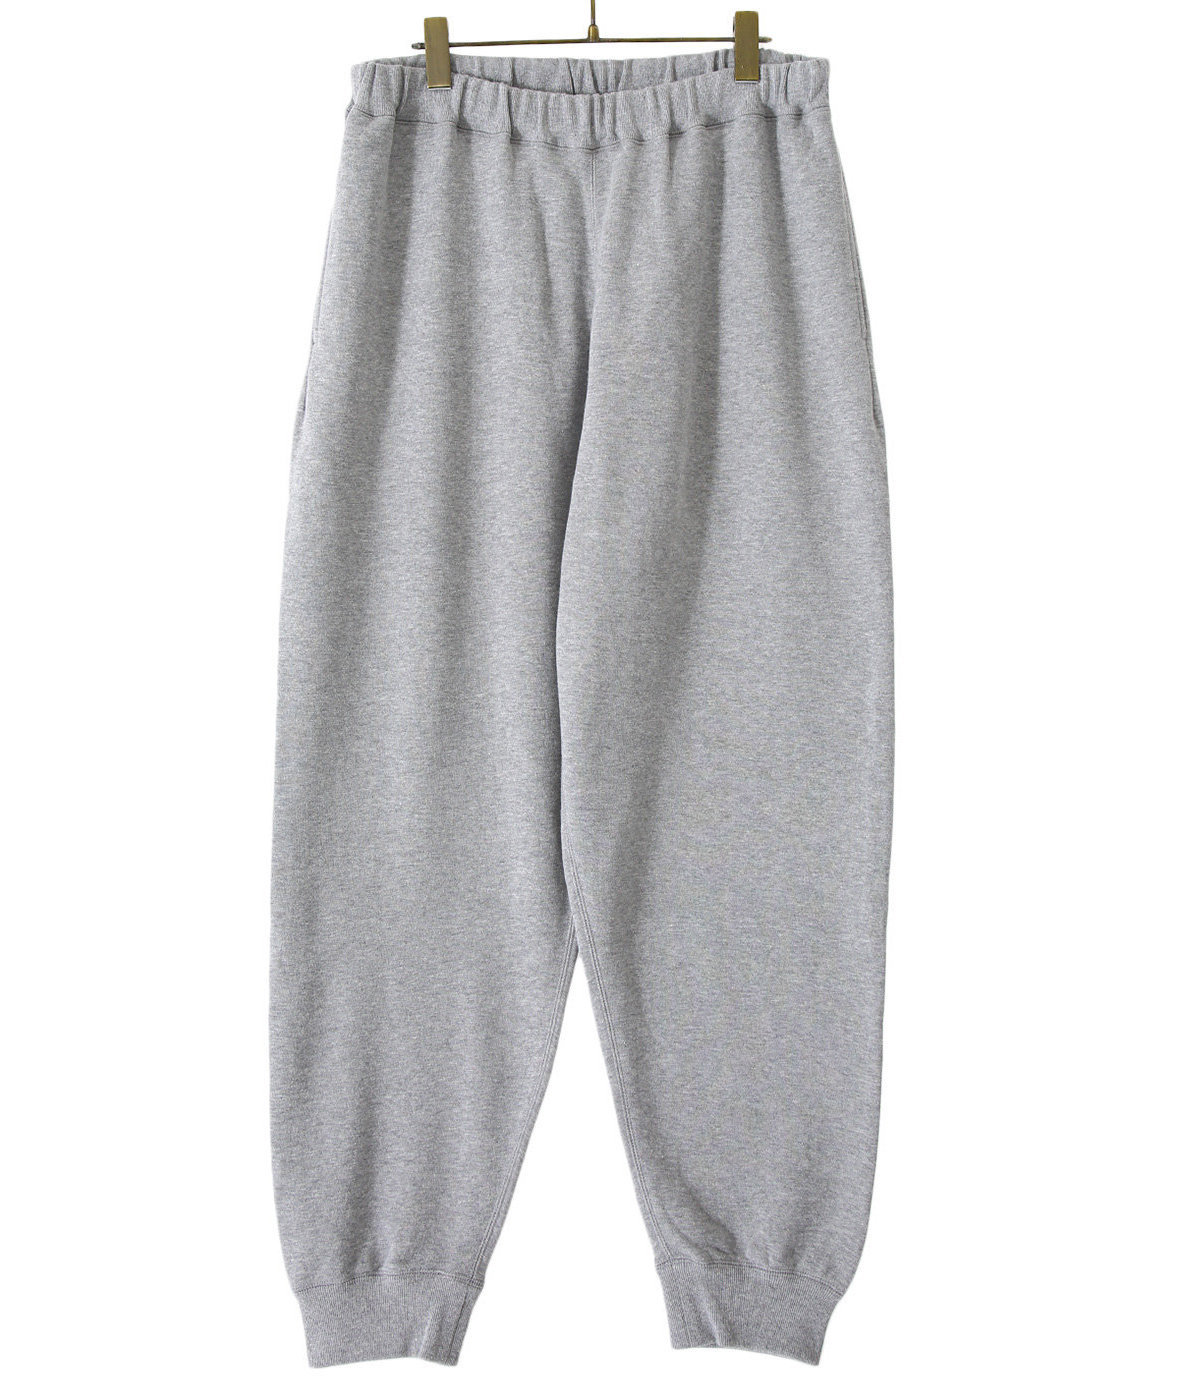 【ONLY ARK】別注 LOOPWHEELER for GP Sweat Pants